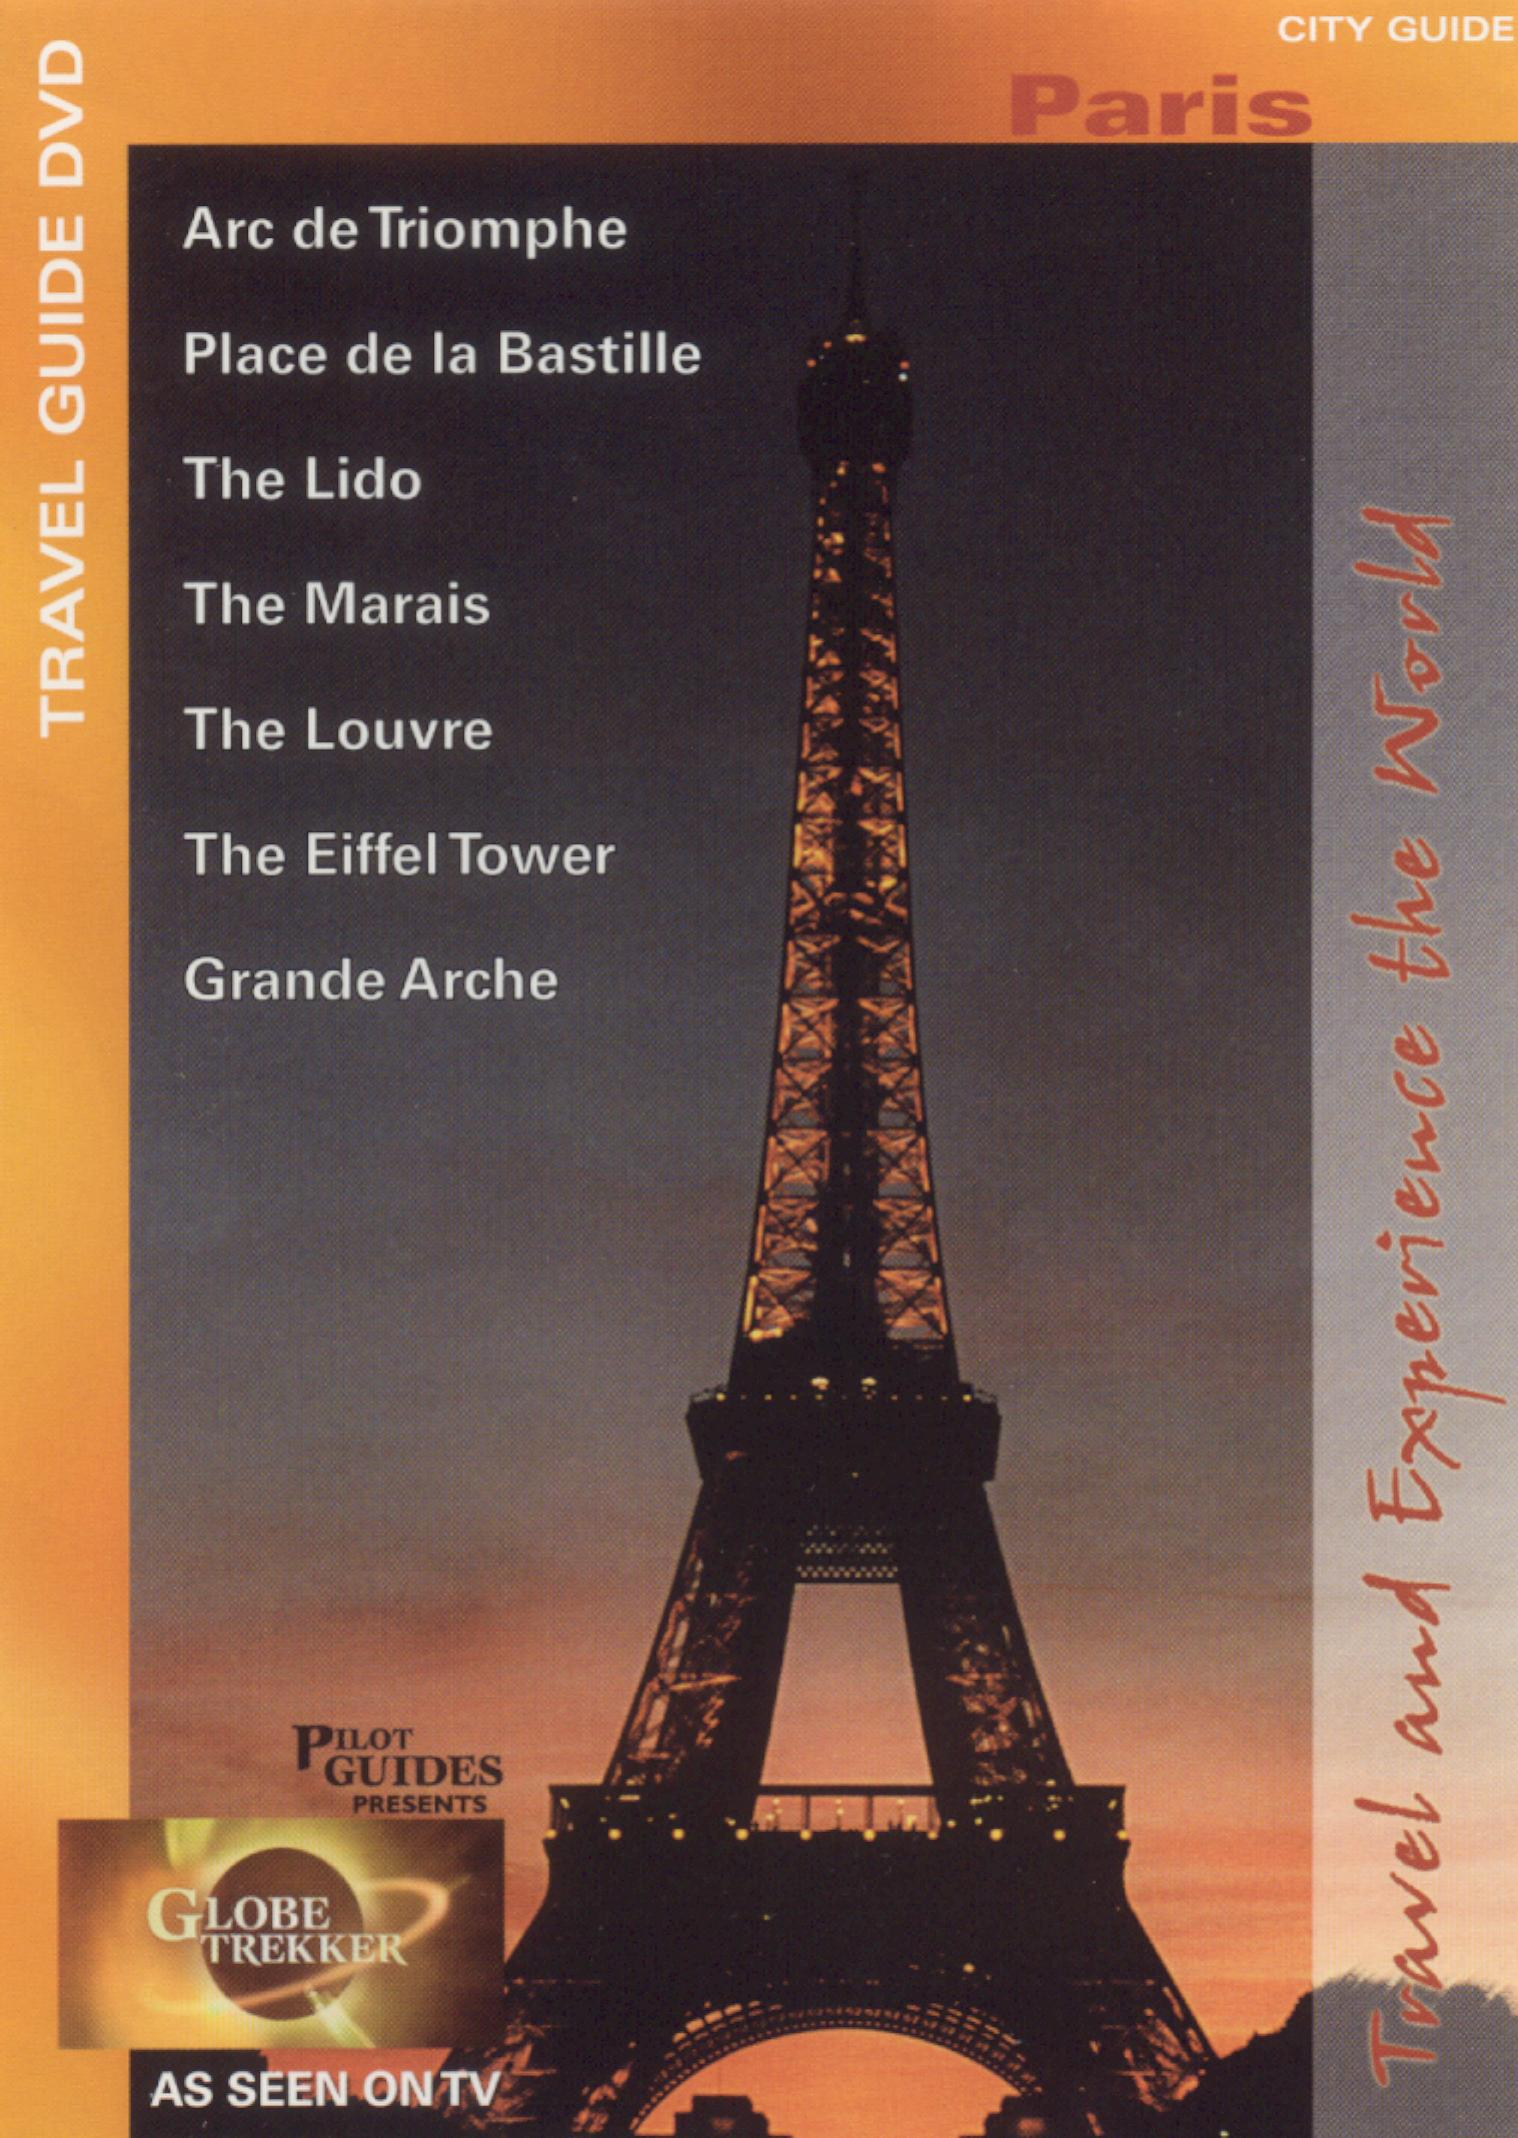 Globe Trekker: Paris City Guide